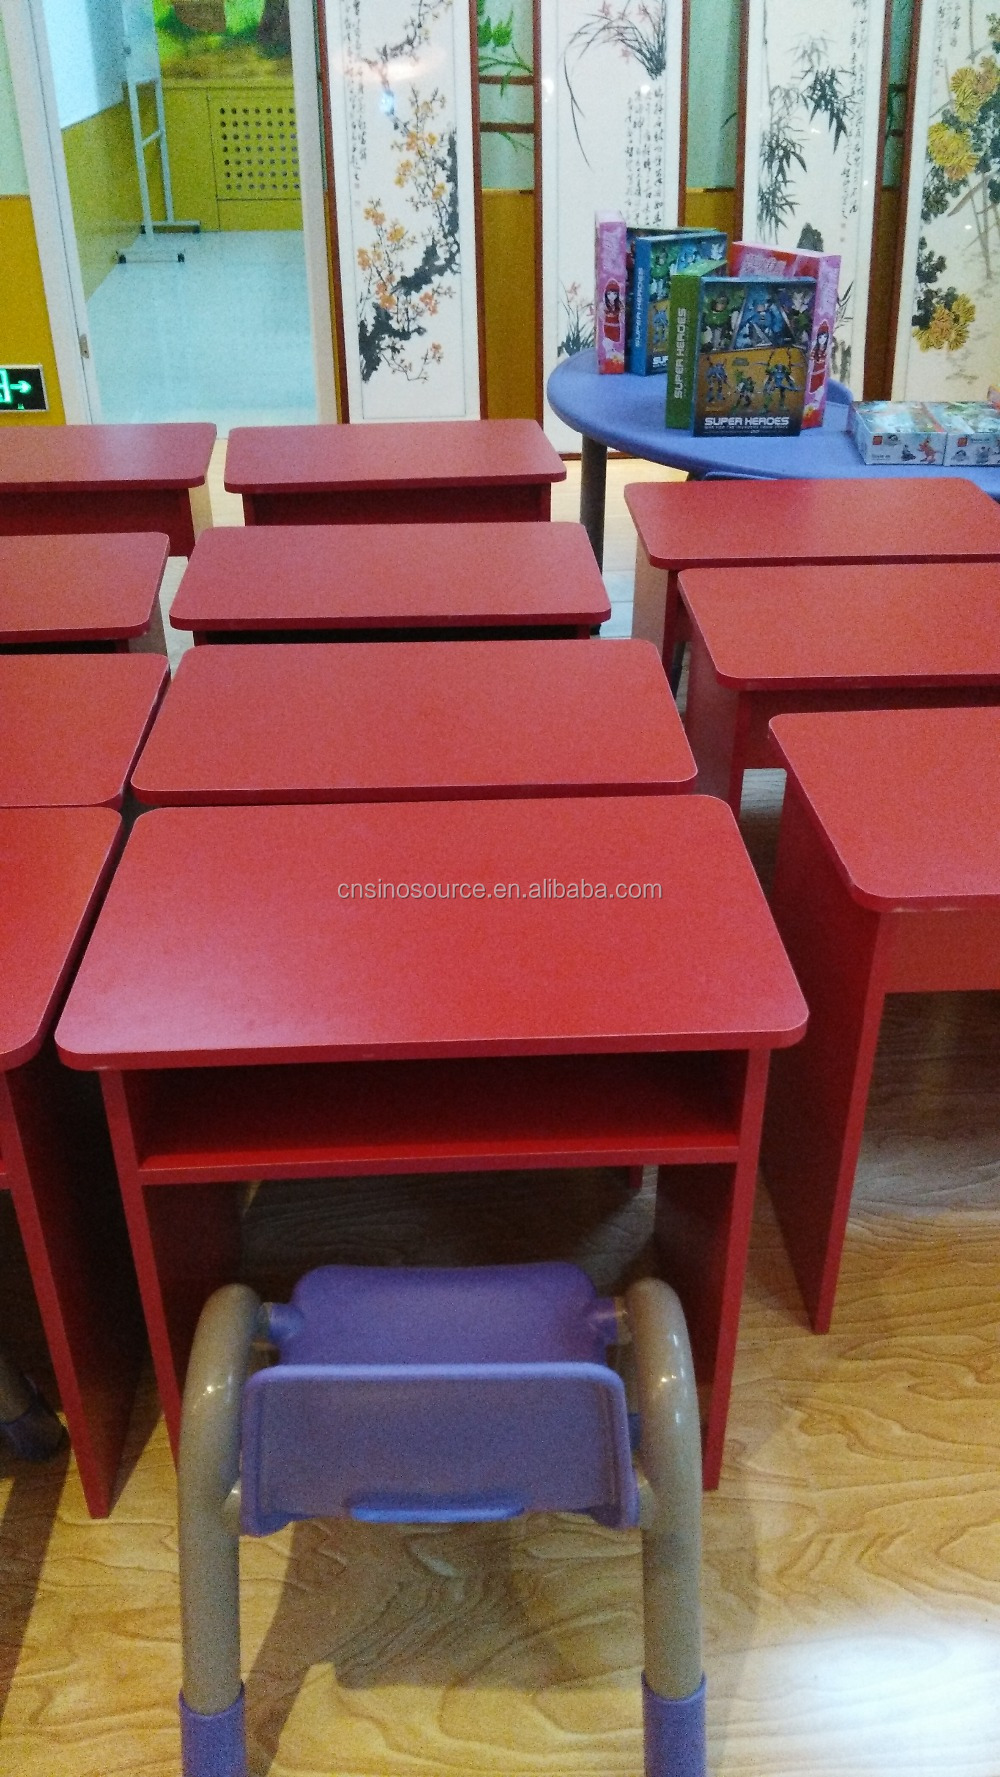 wholesale small puter desk school furniture study table